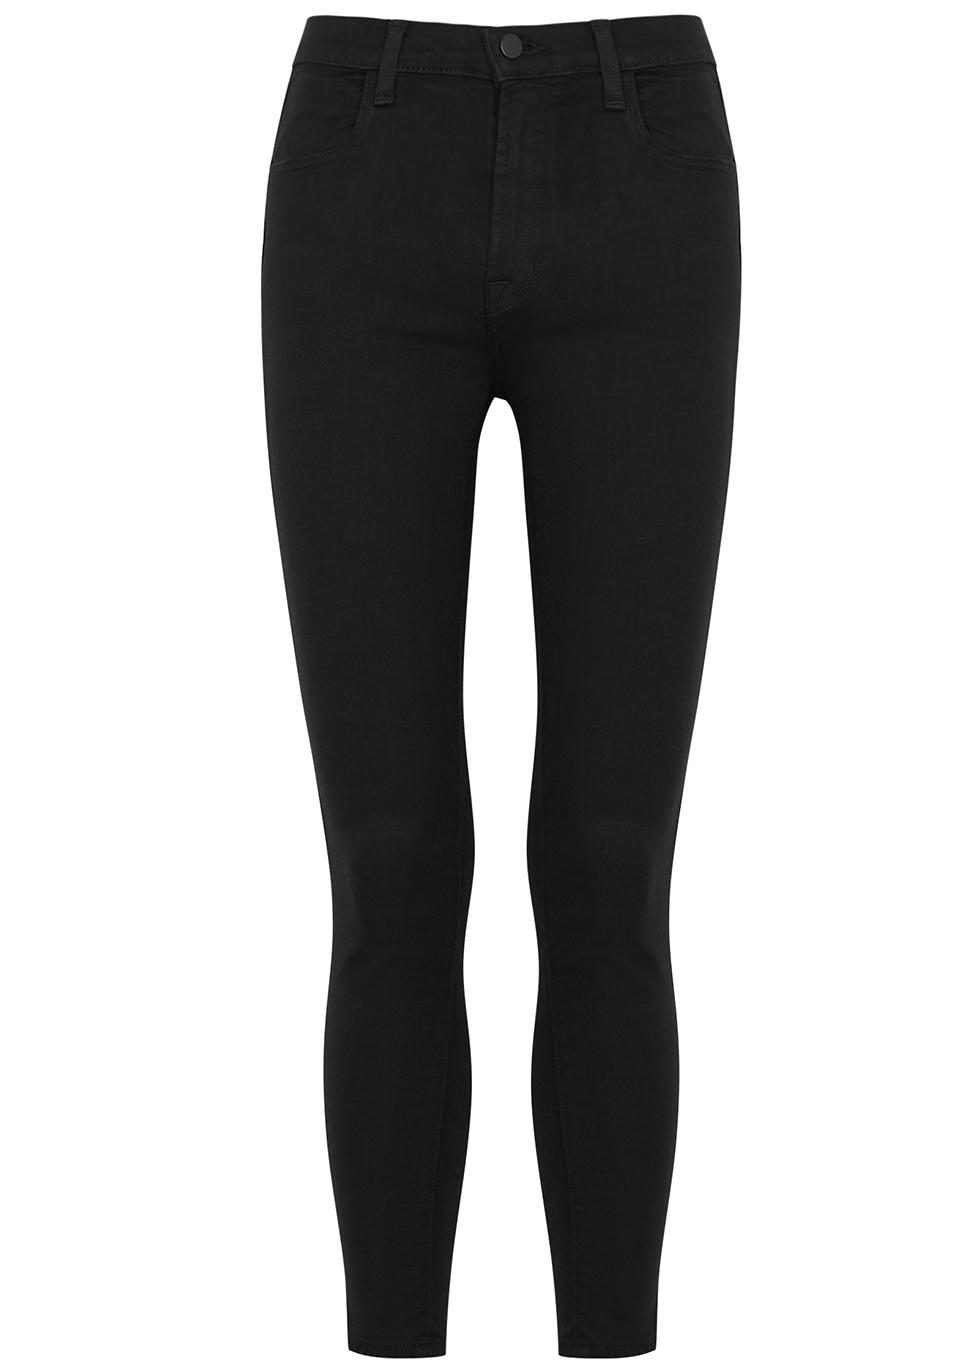 a772498c228 Women's Designer Denim Jeans - Harvey Nichols